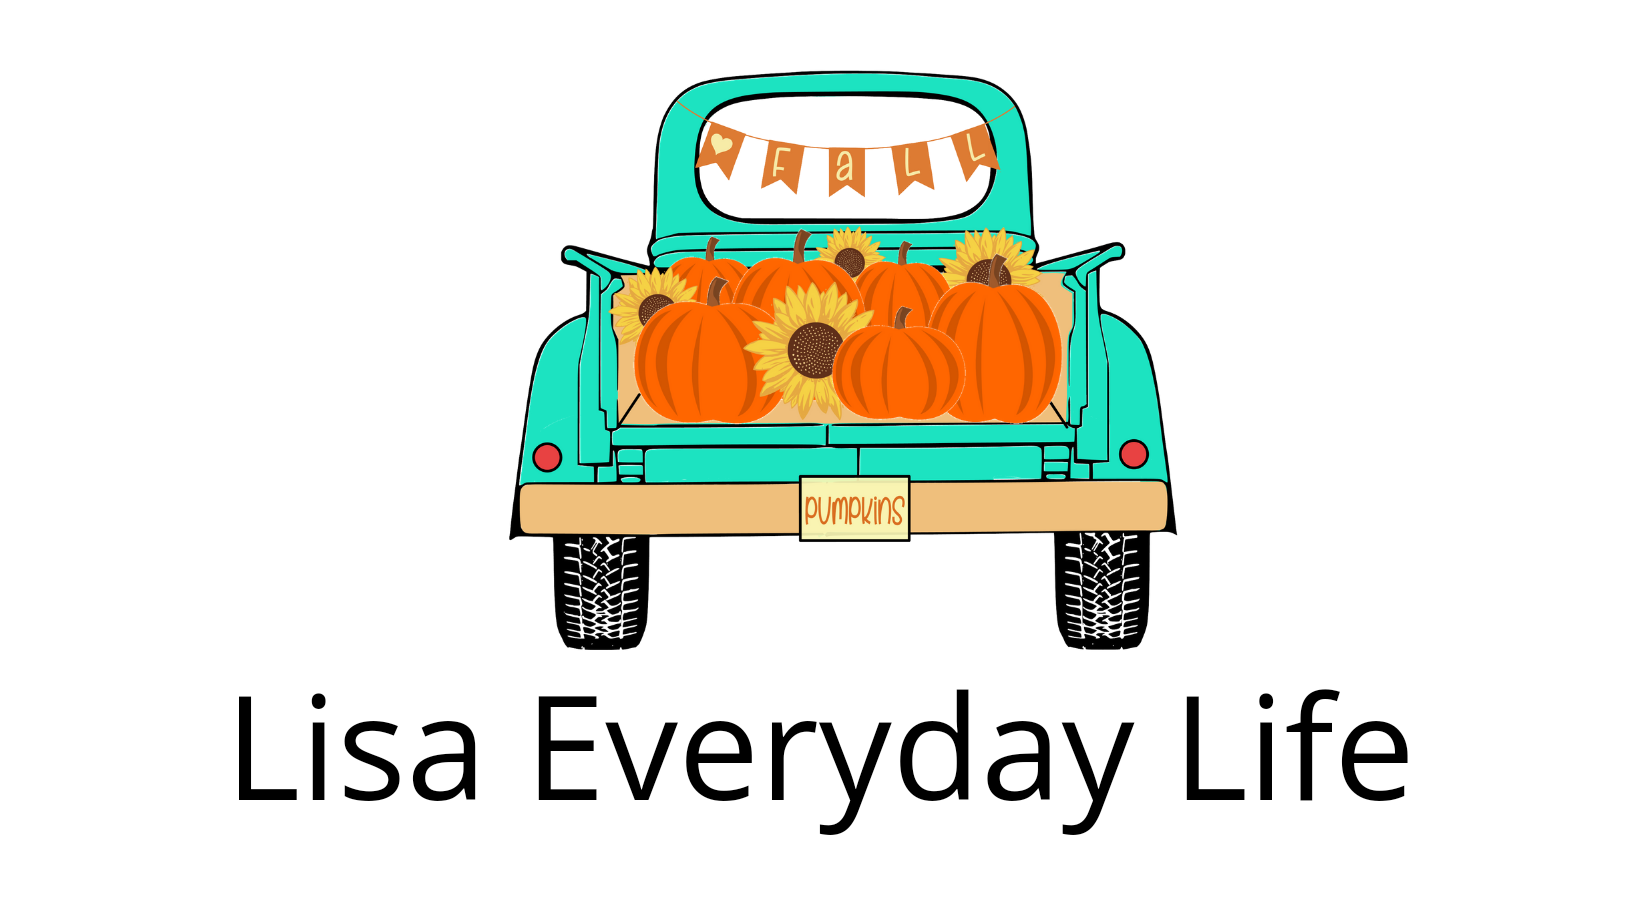 Lisa s Everyday Life